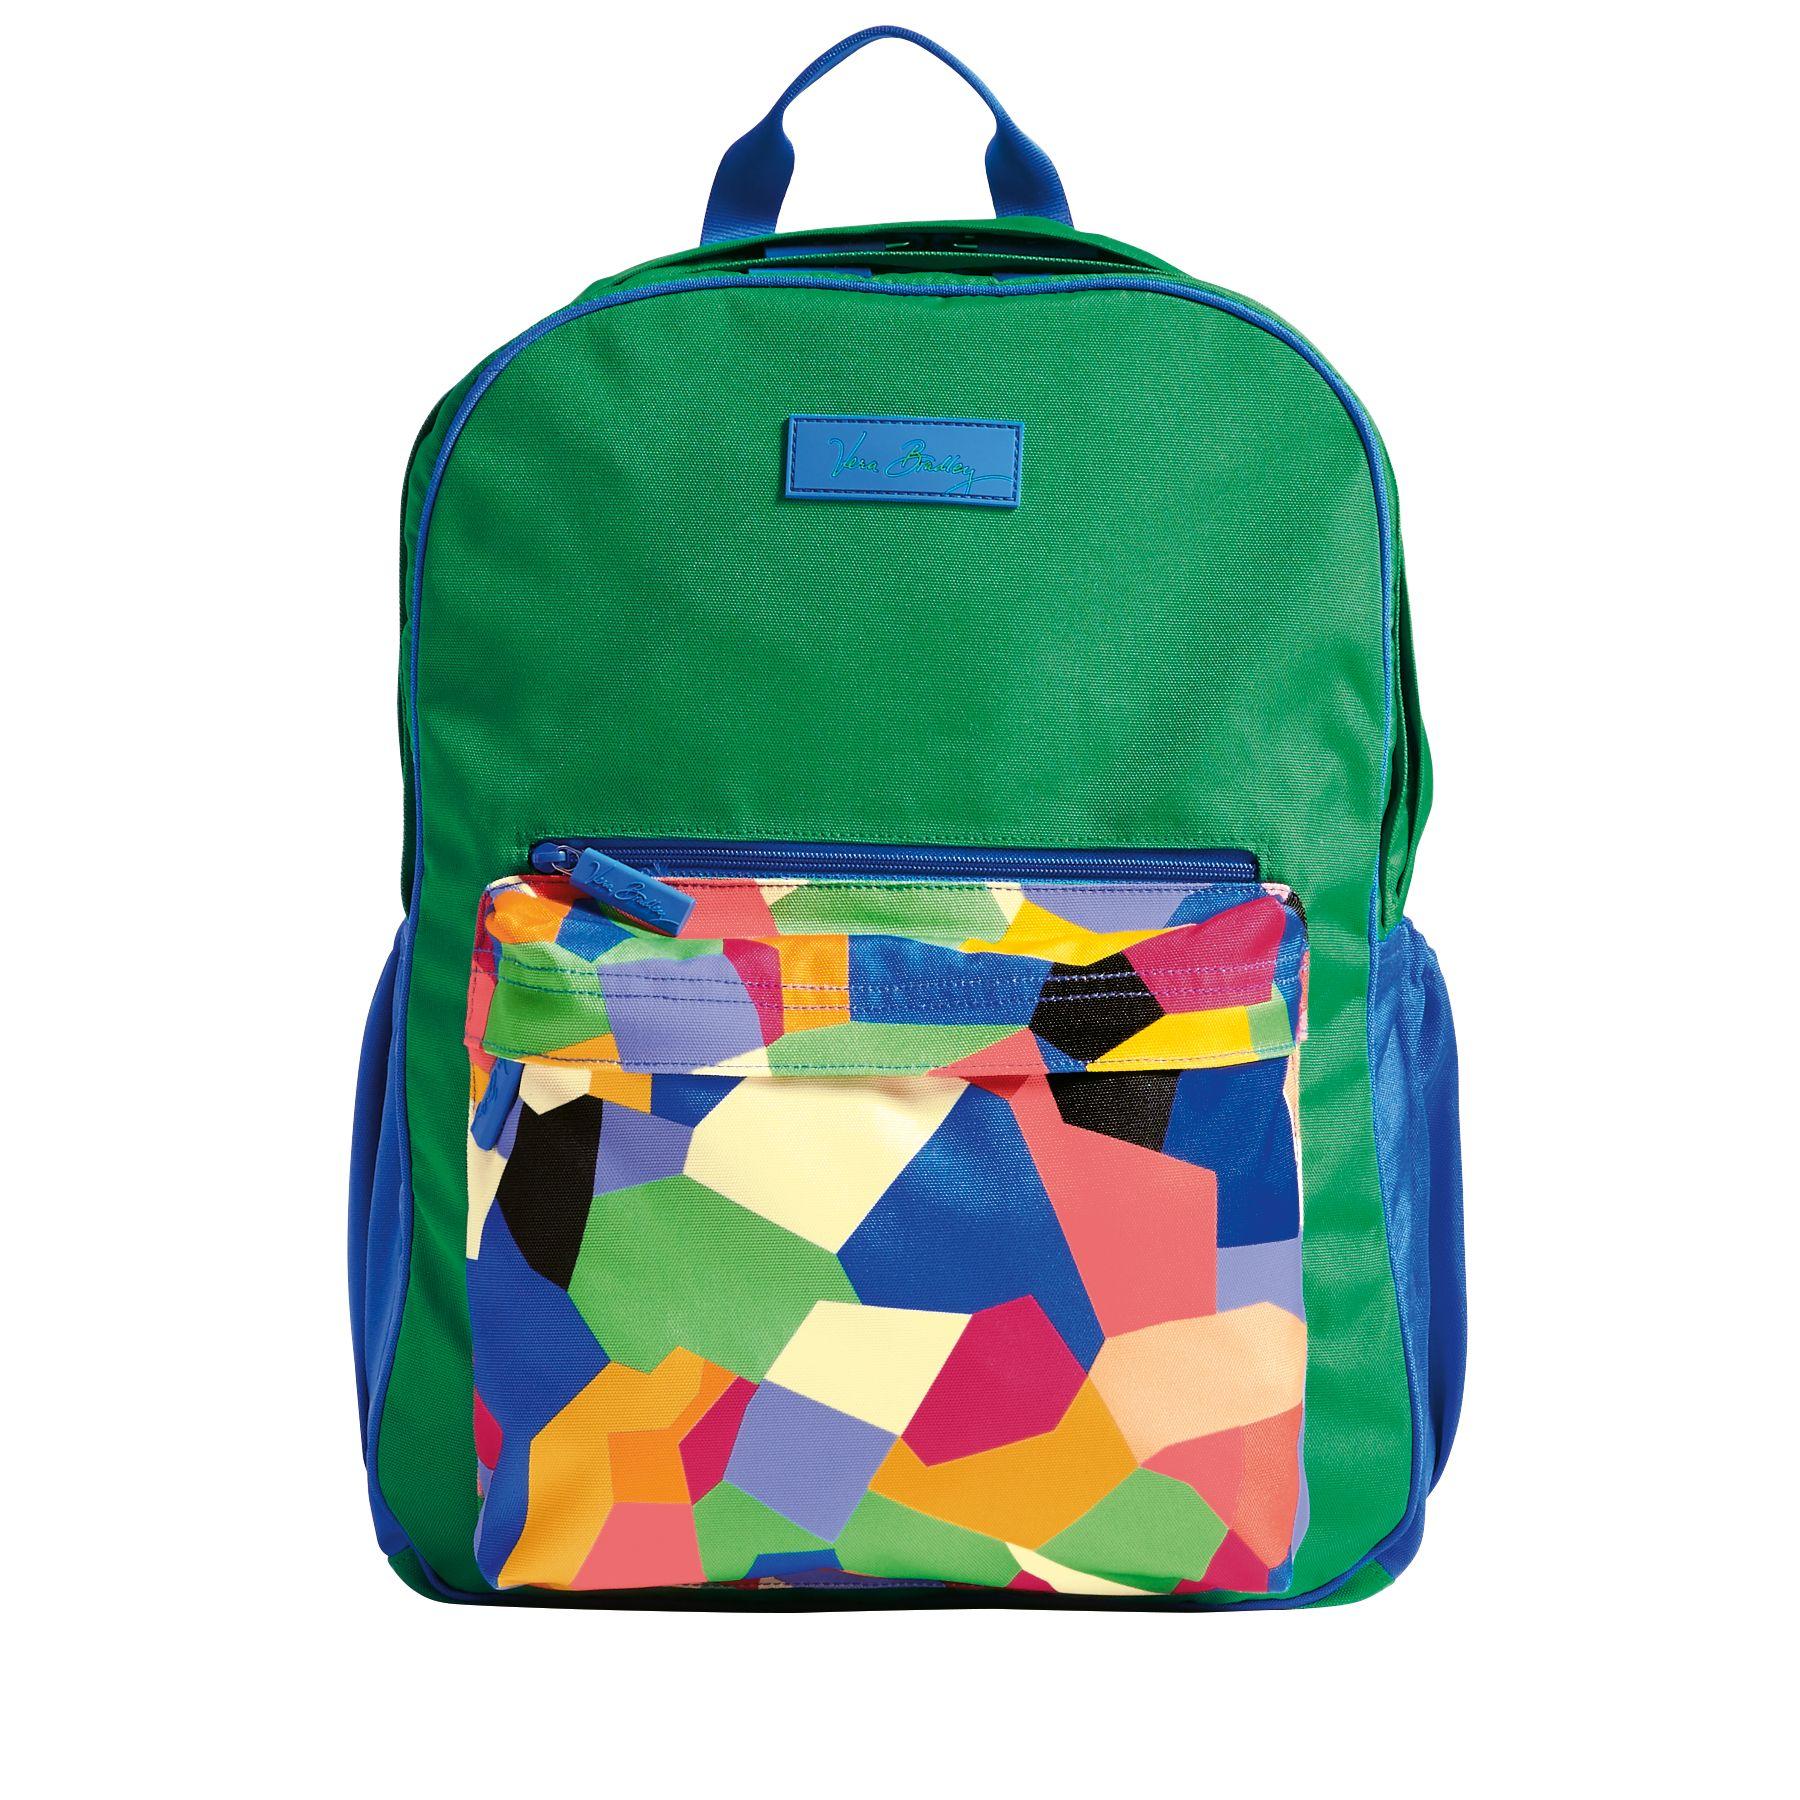 Panoty Store | Vera Bradley Designs Inc. | Bags